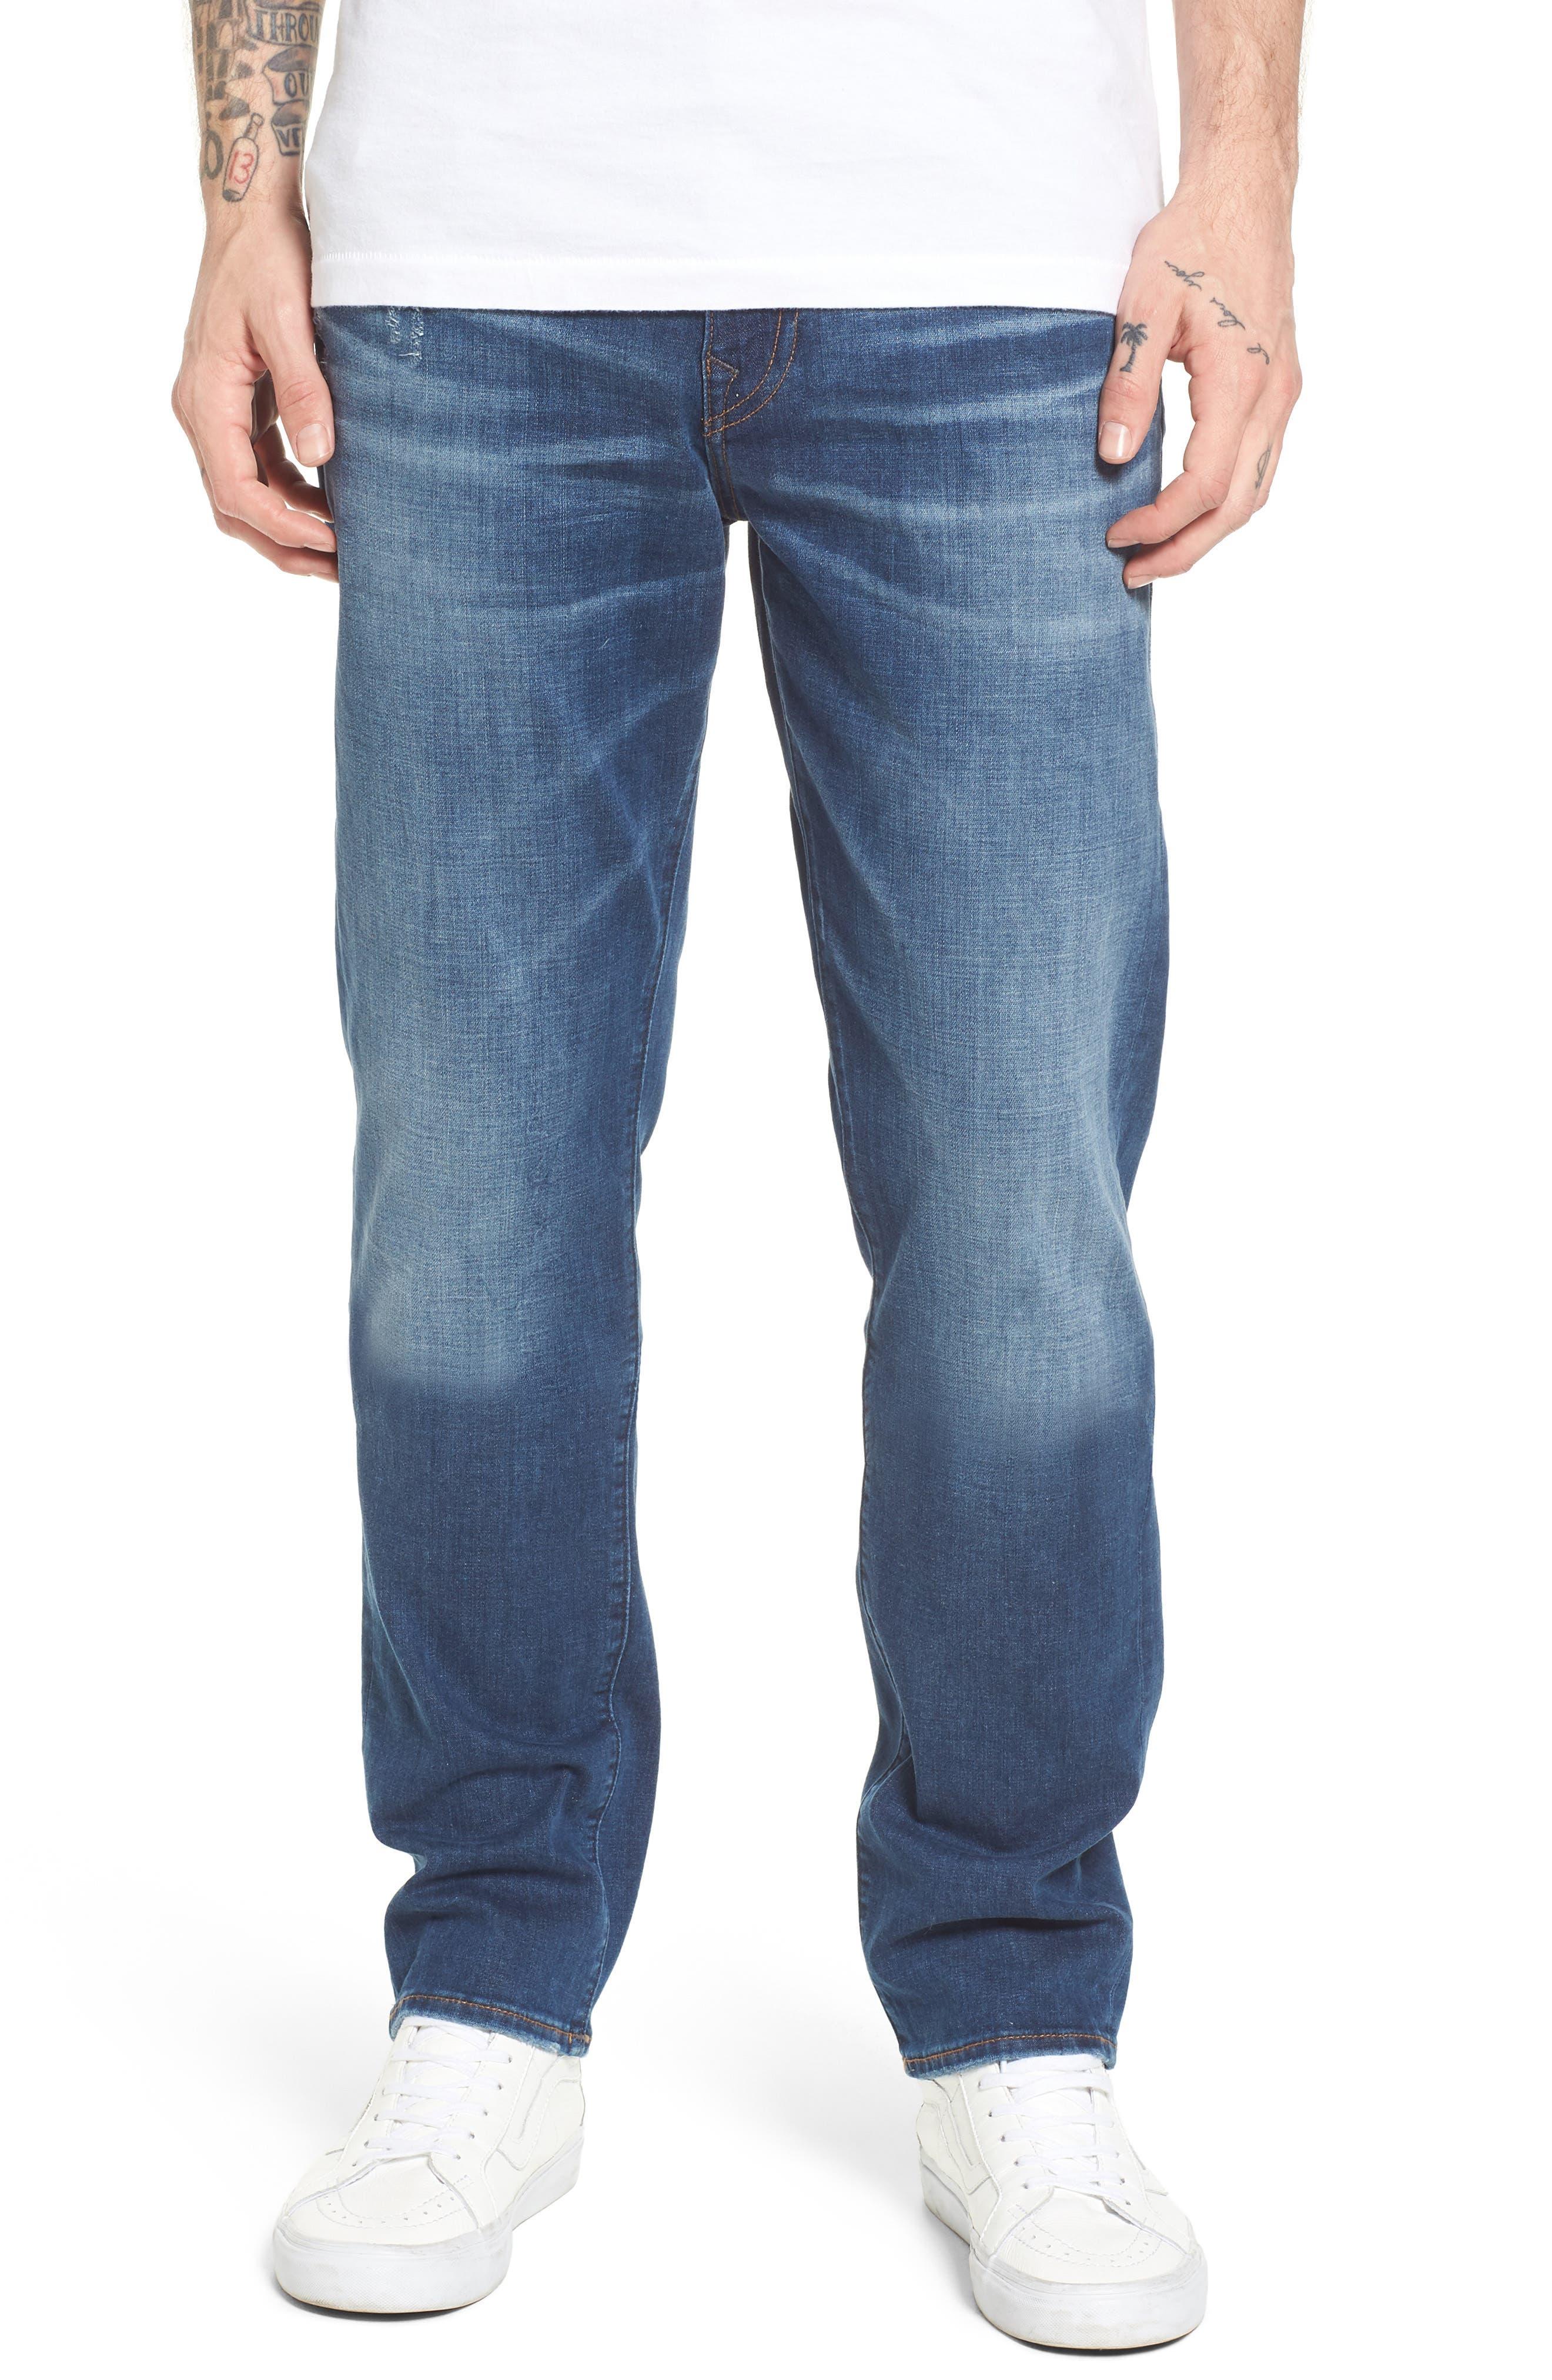 Geno Straight Leg Jeans,                             Main thumbnail 1, color,